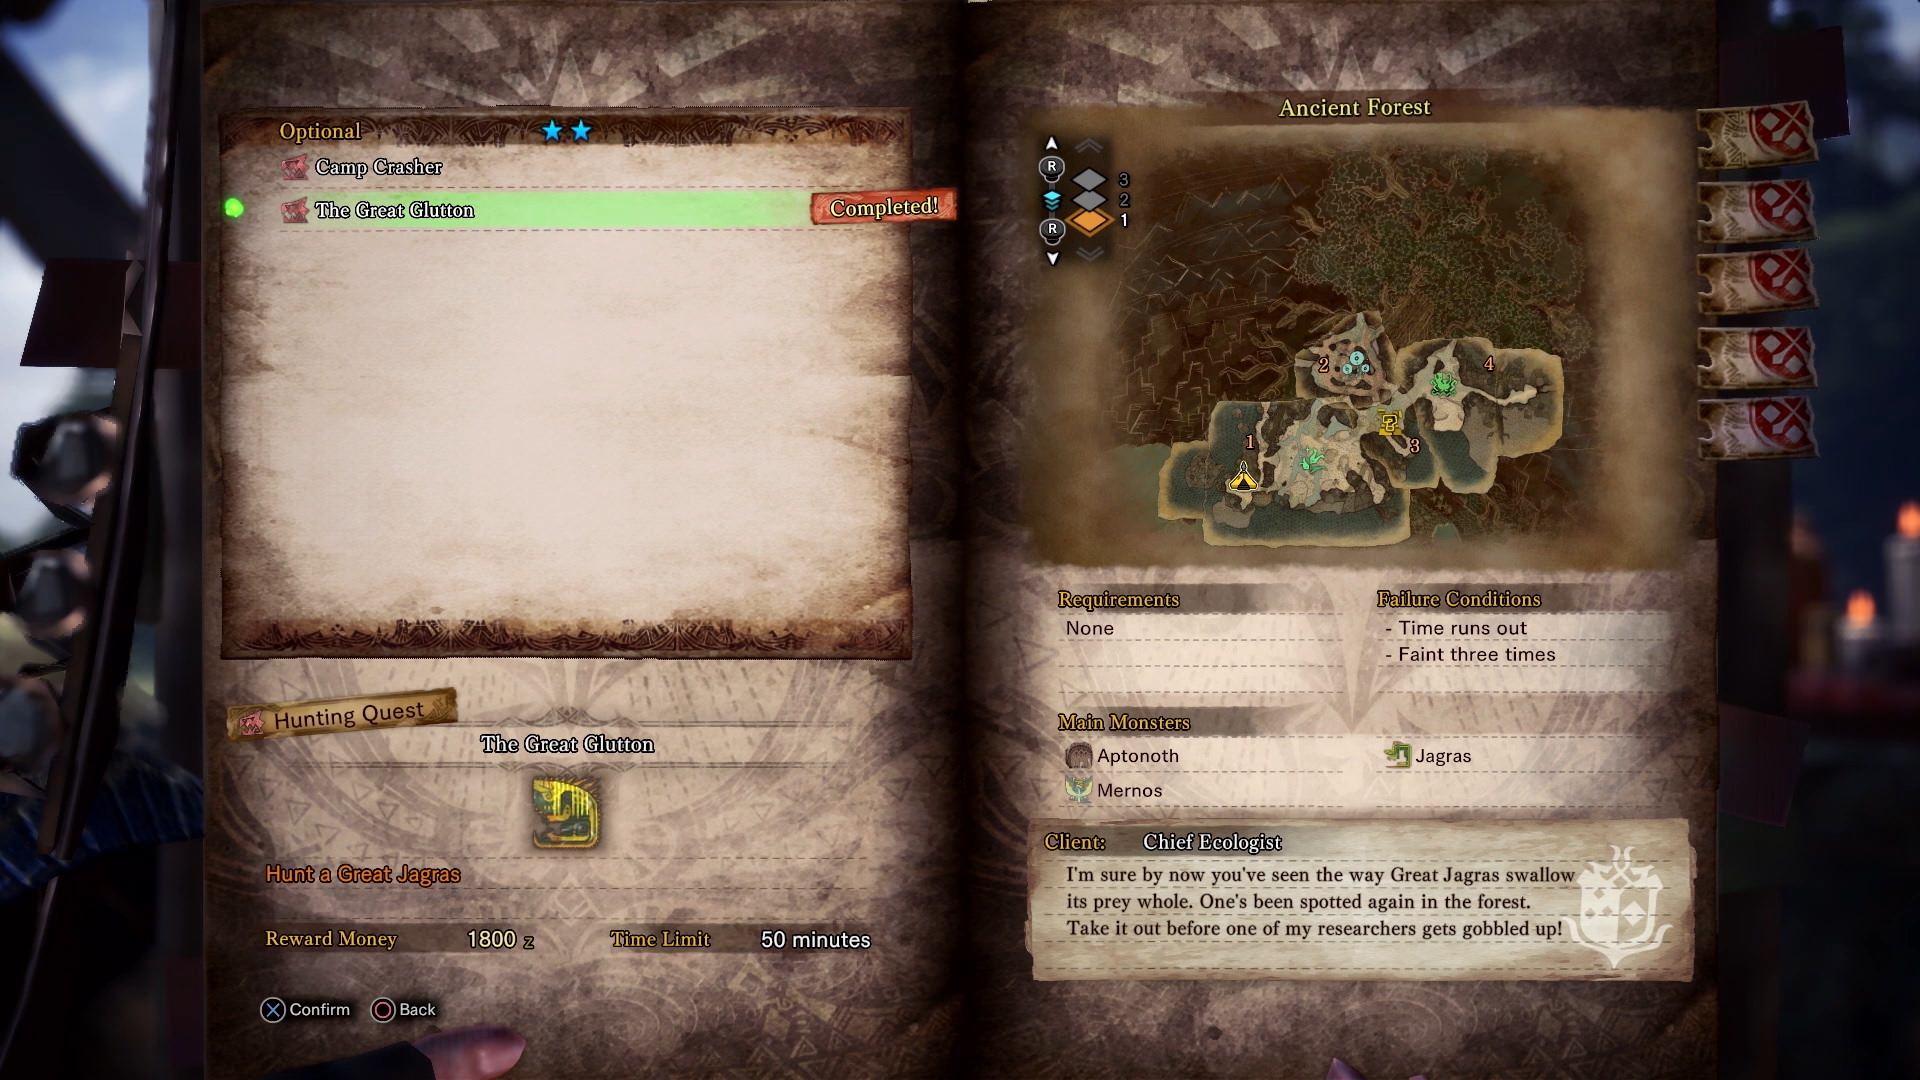 Monster Hunter World, Sony PlayStation 4, Capcom, Map, New World